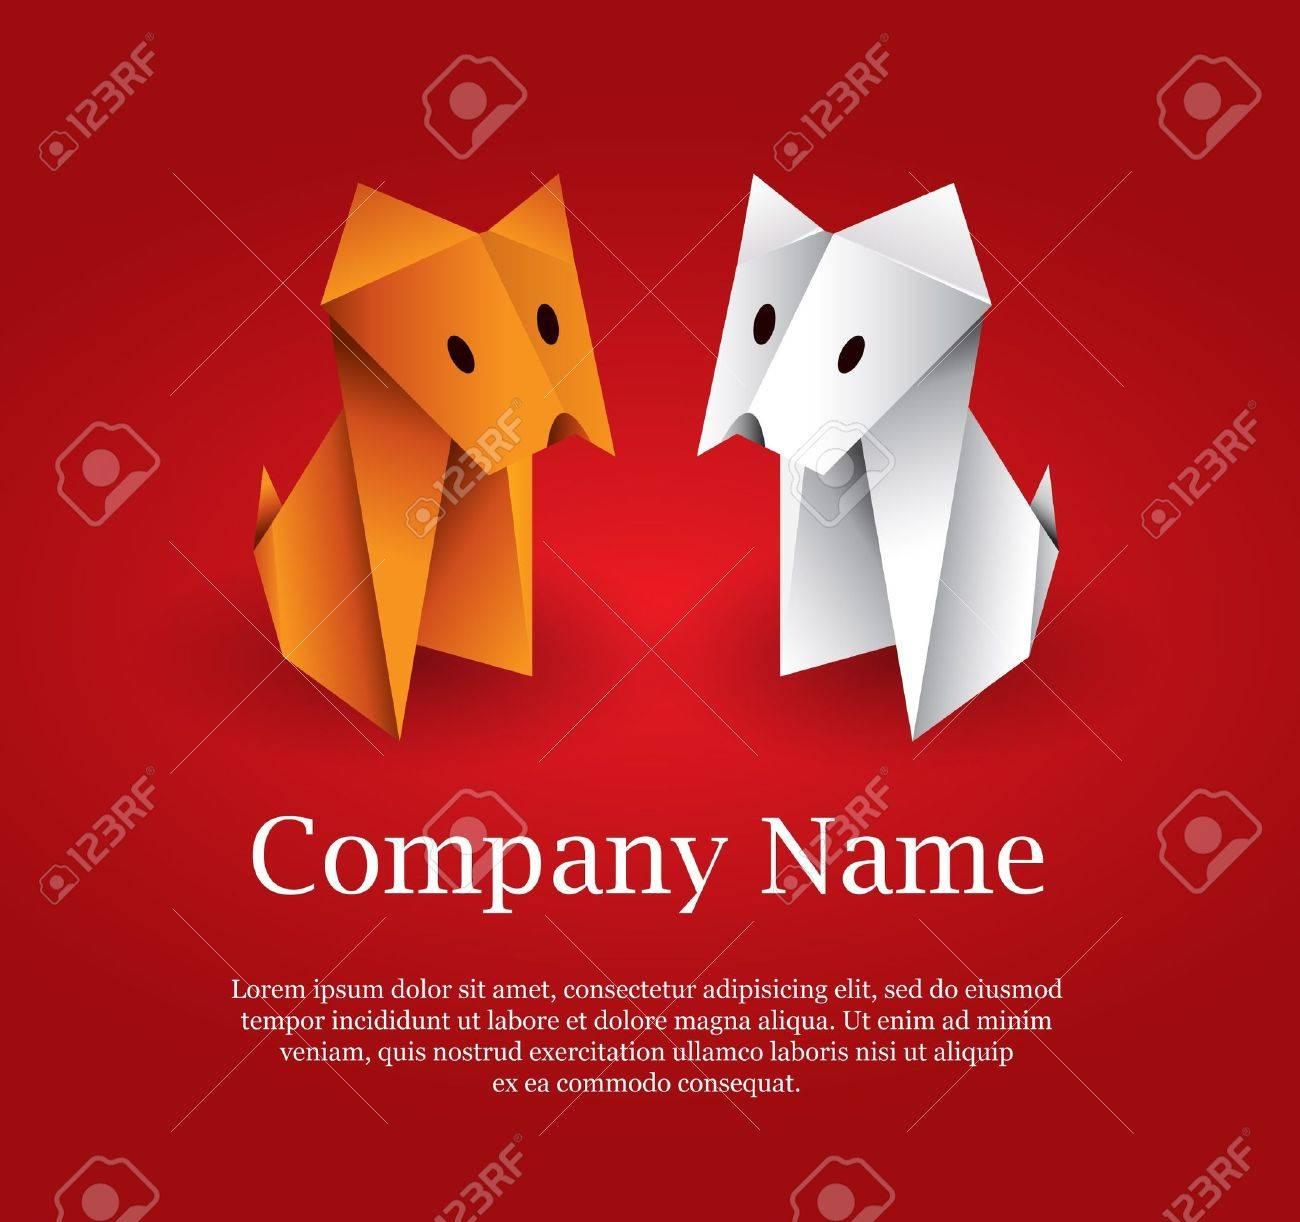 Origami Stock Vector - 10415611